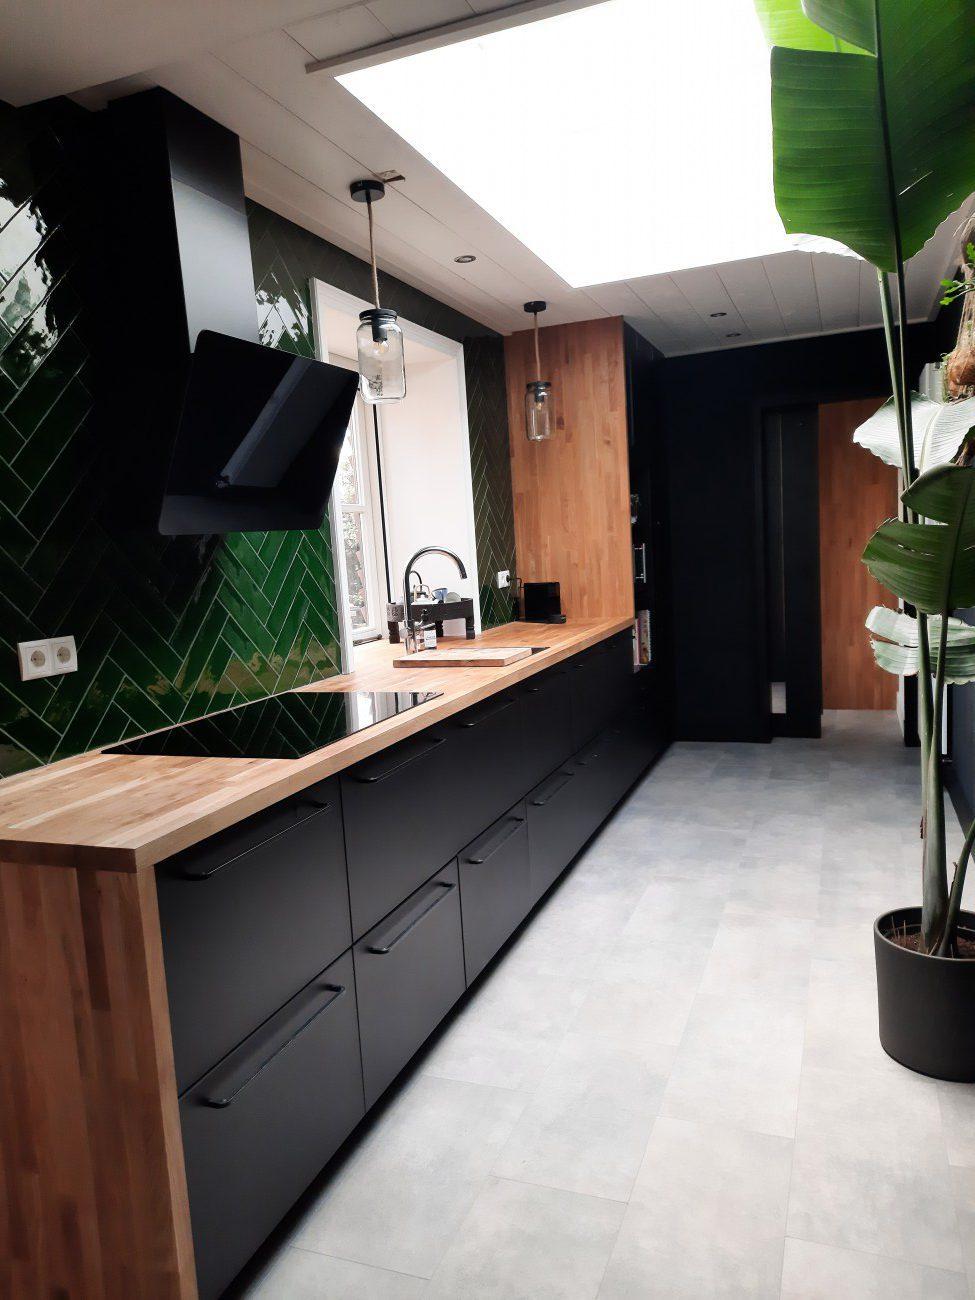 keuken verbouwing